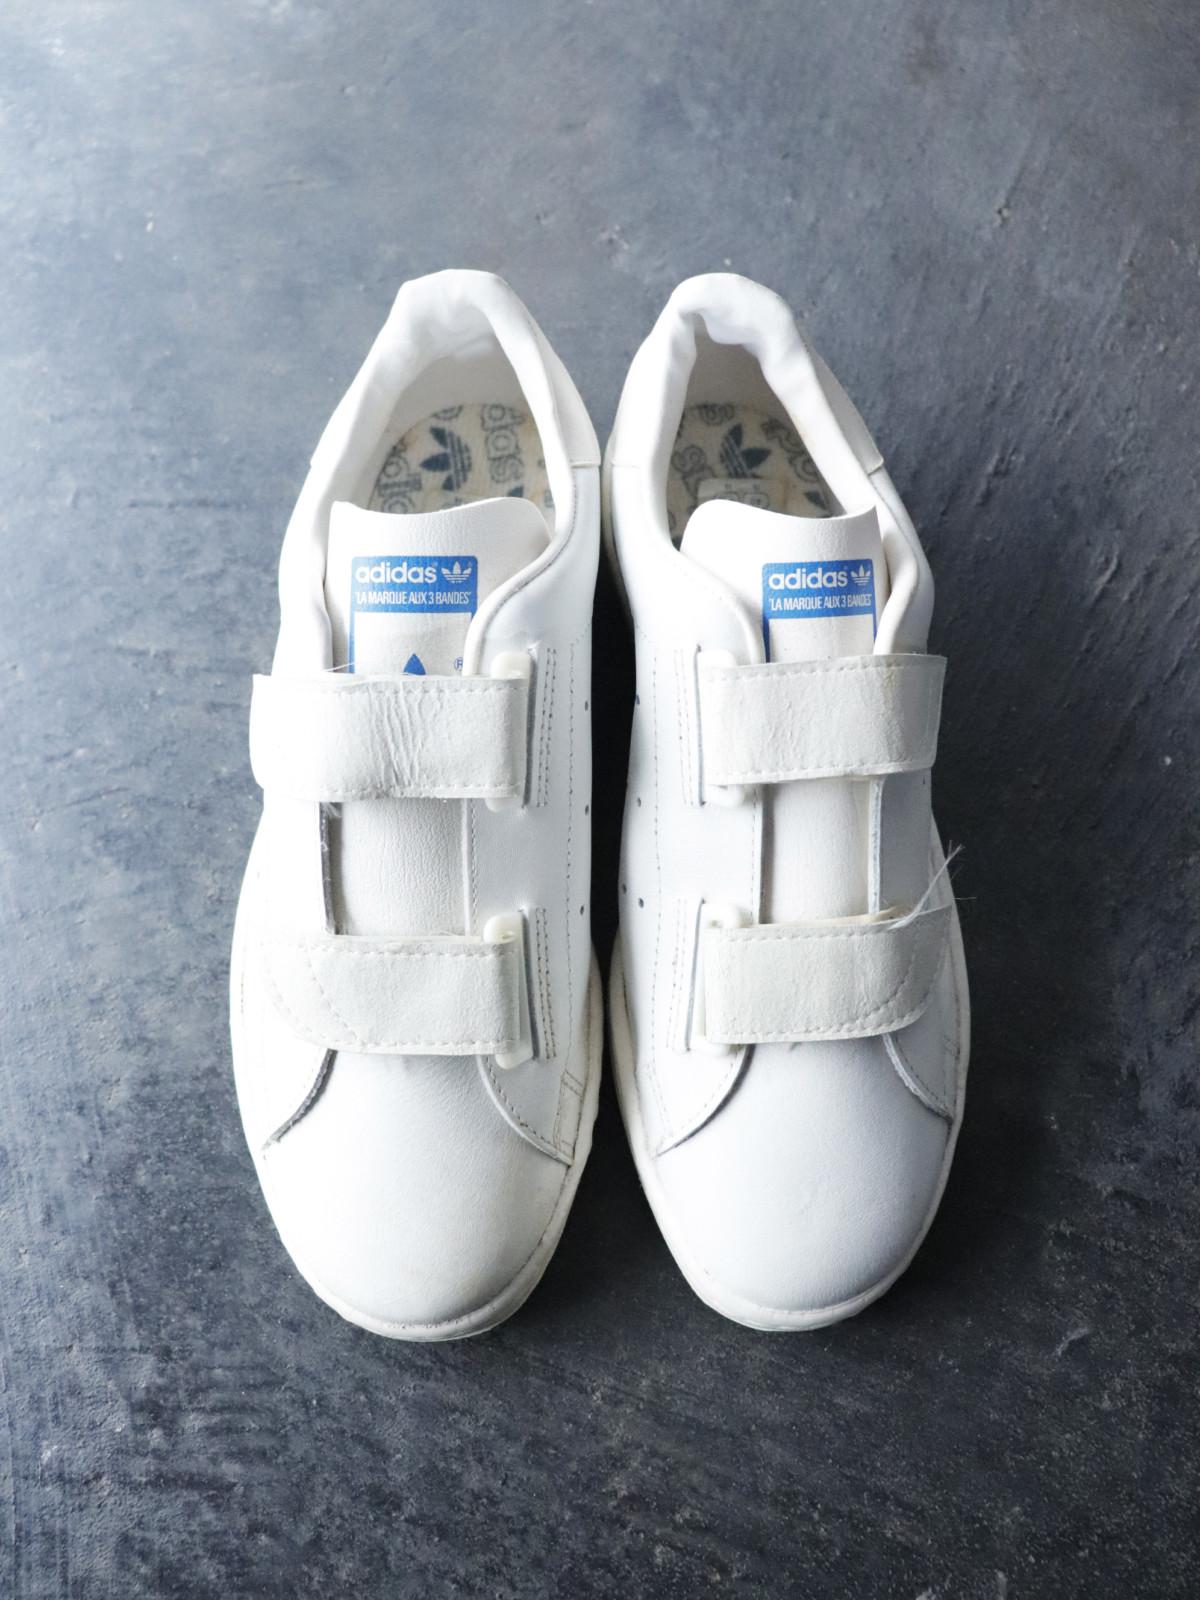 Dead Stock, ADIDAS, sneaker, France